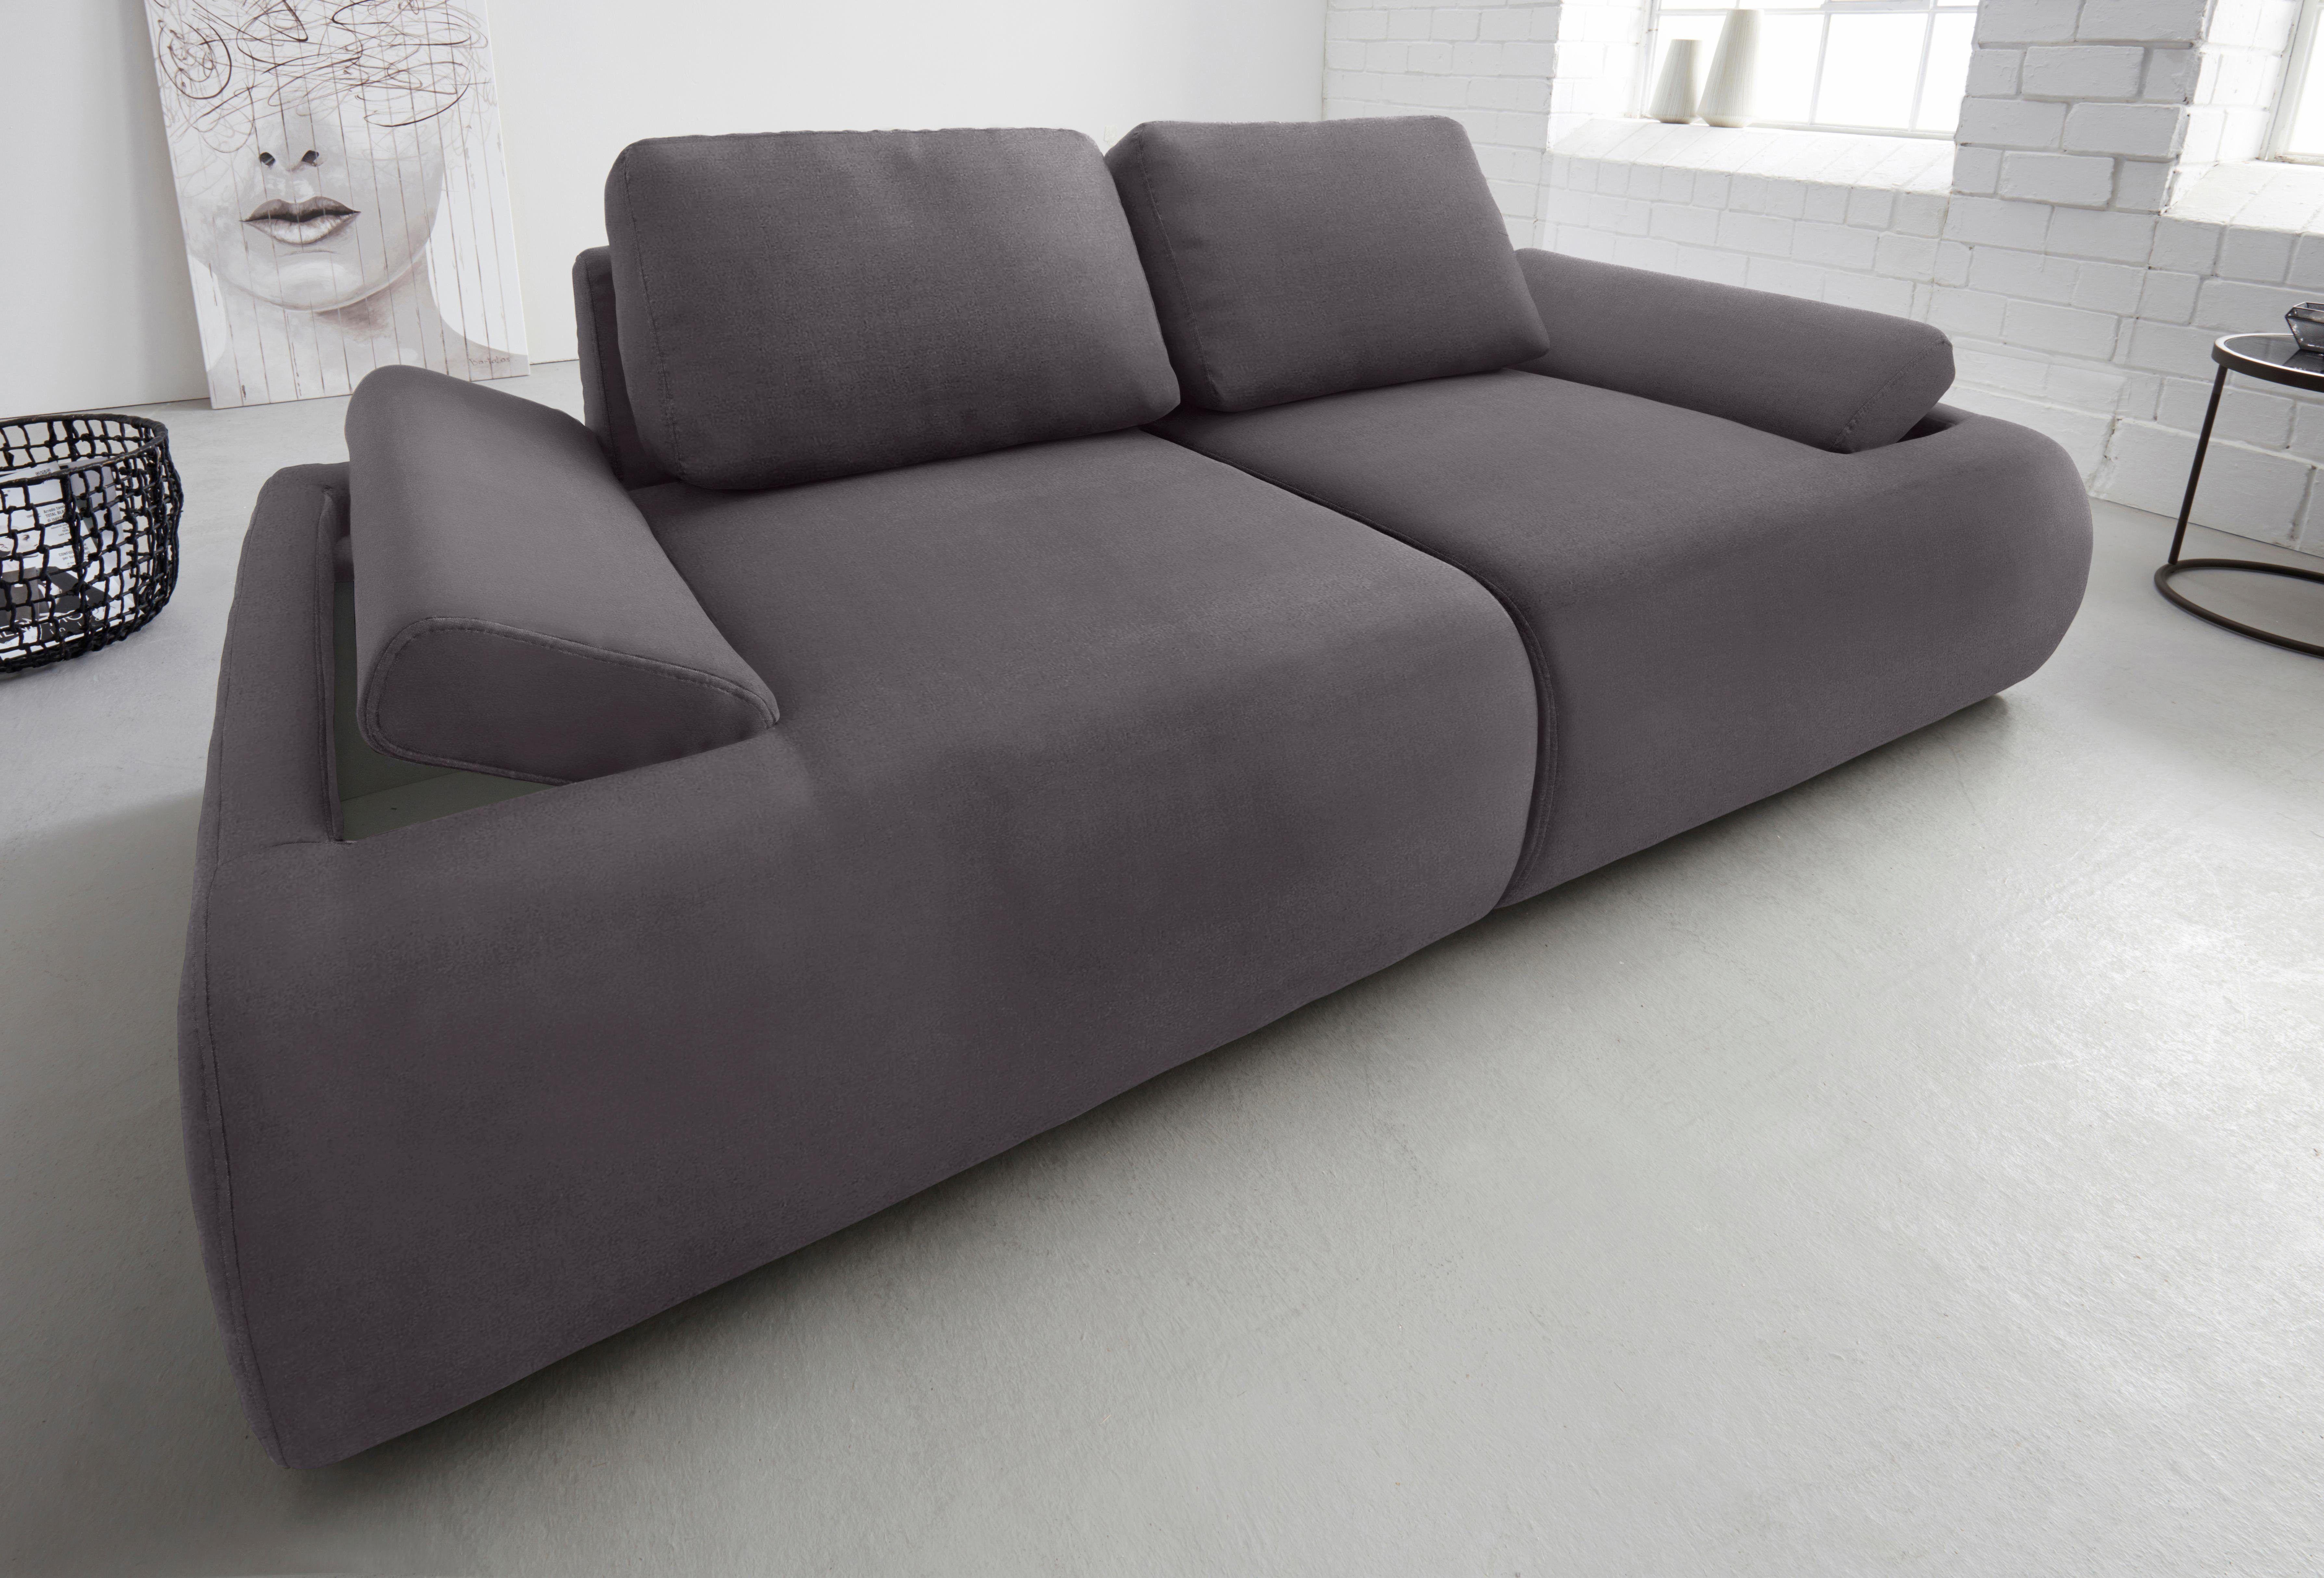 Bemerkenswert Big Sofa Grau Foto Von Inosign Grau, Bigsofa Xl, Fsc®-zertifiziert Jetzt Bestellen